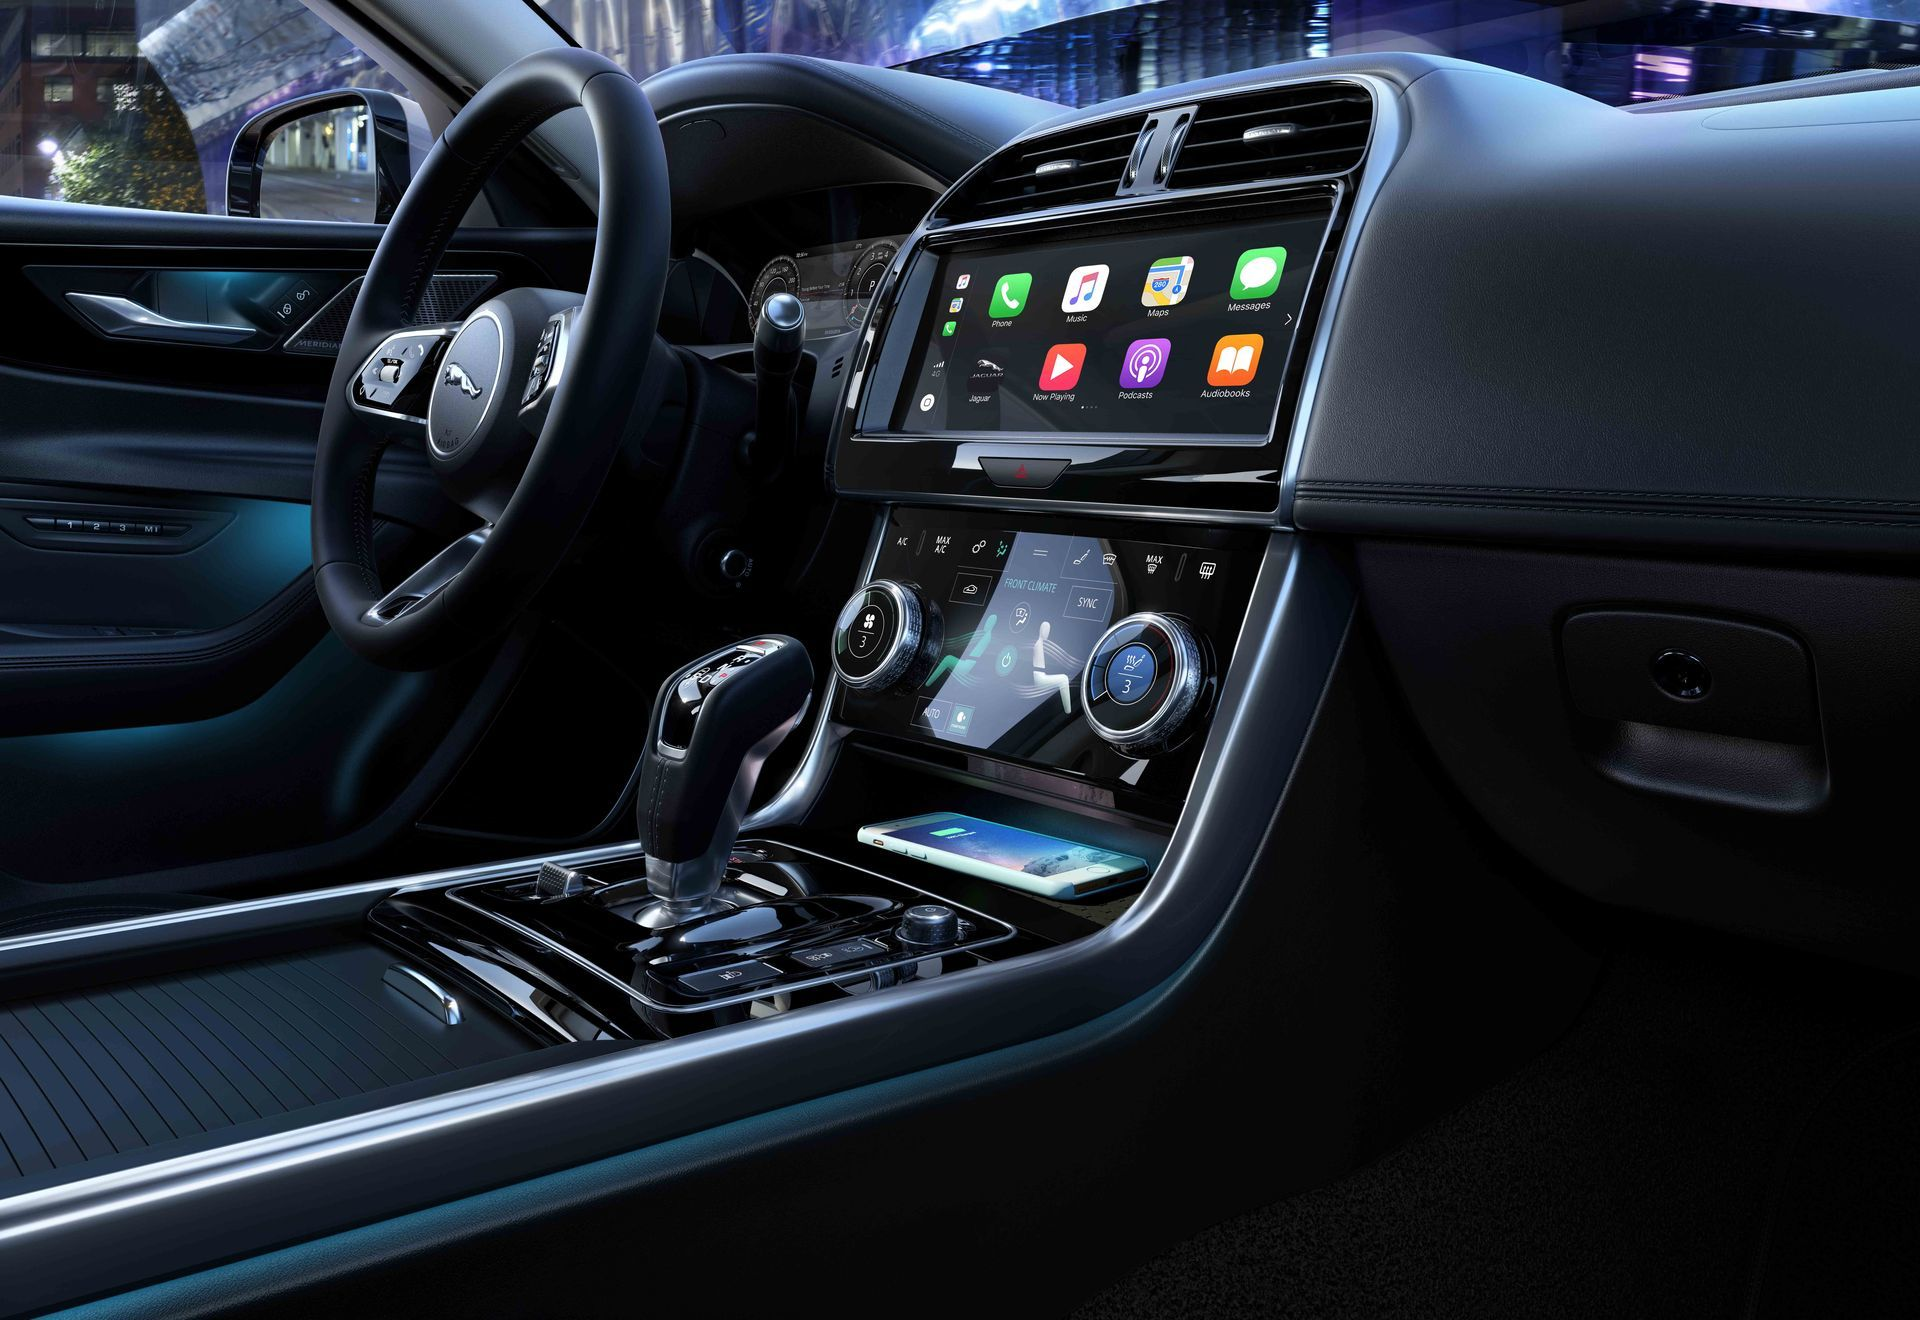 Jaguar Xe 2019 8 Interior